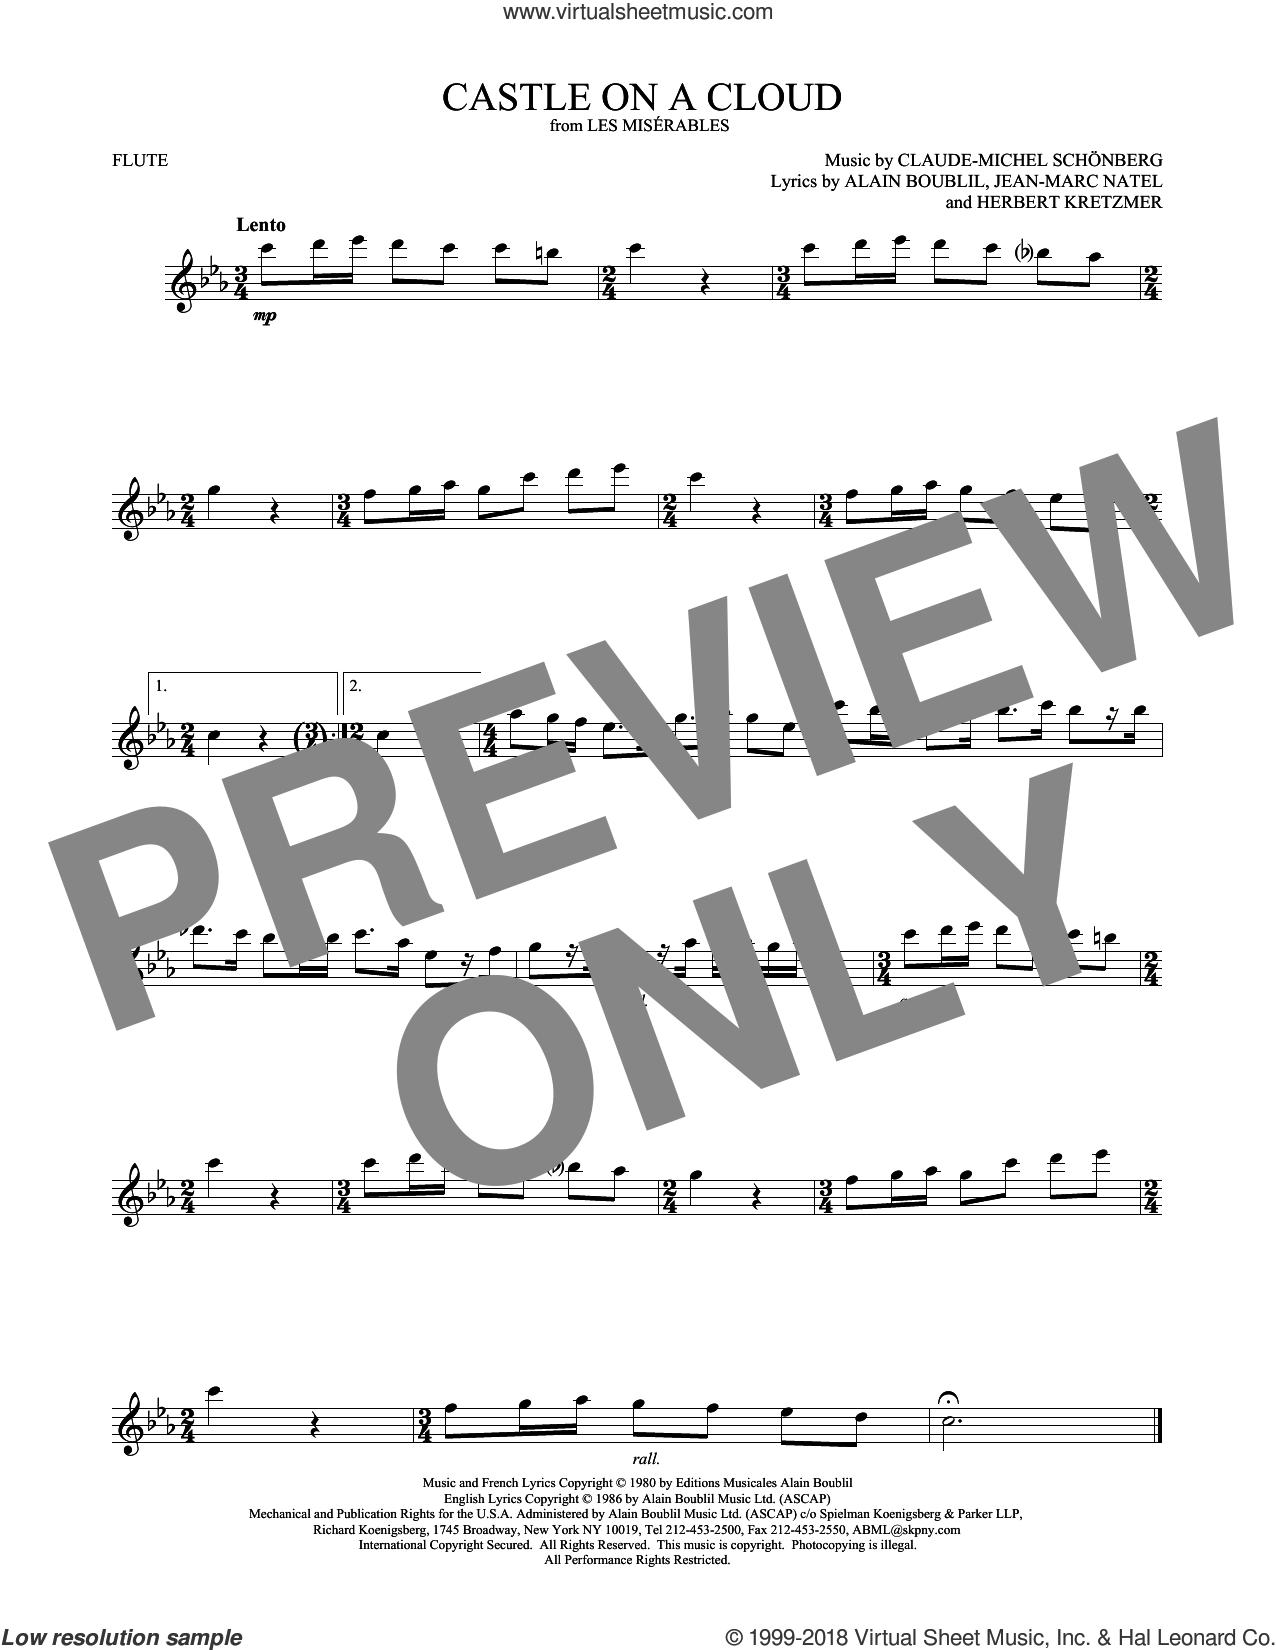 Castle On A Cloud sheet music for flute solo by Alain Boublil, Claude-Michel Schonberg, Claude-Michel Schonberg, Herbert Kretzmer and Jean-Marc Natel, intermediate skill level